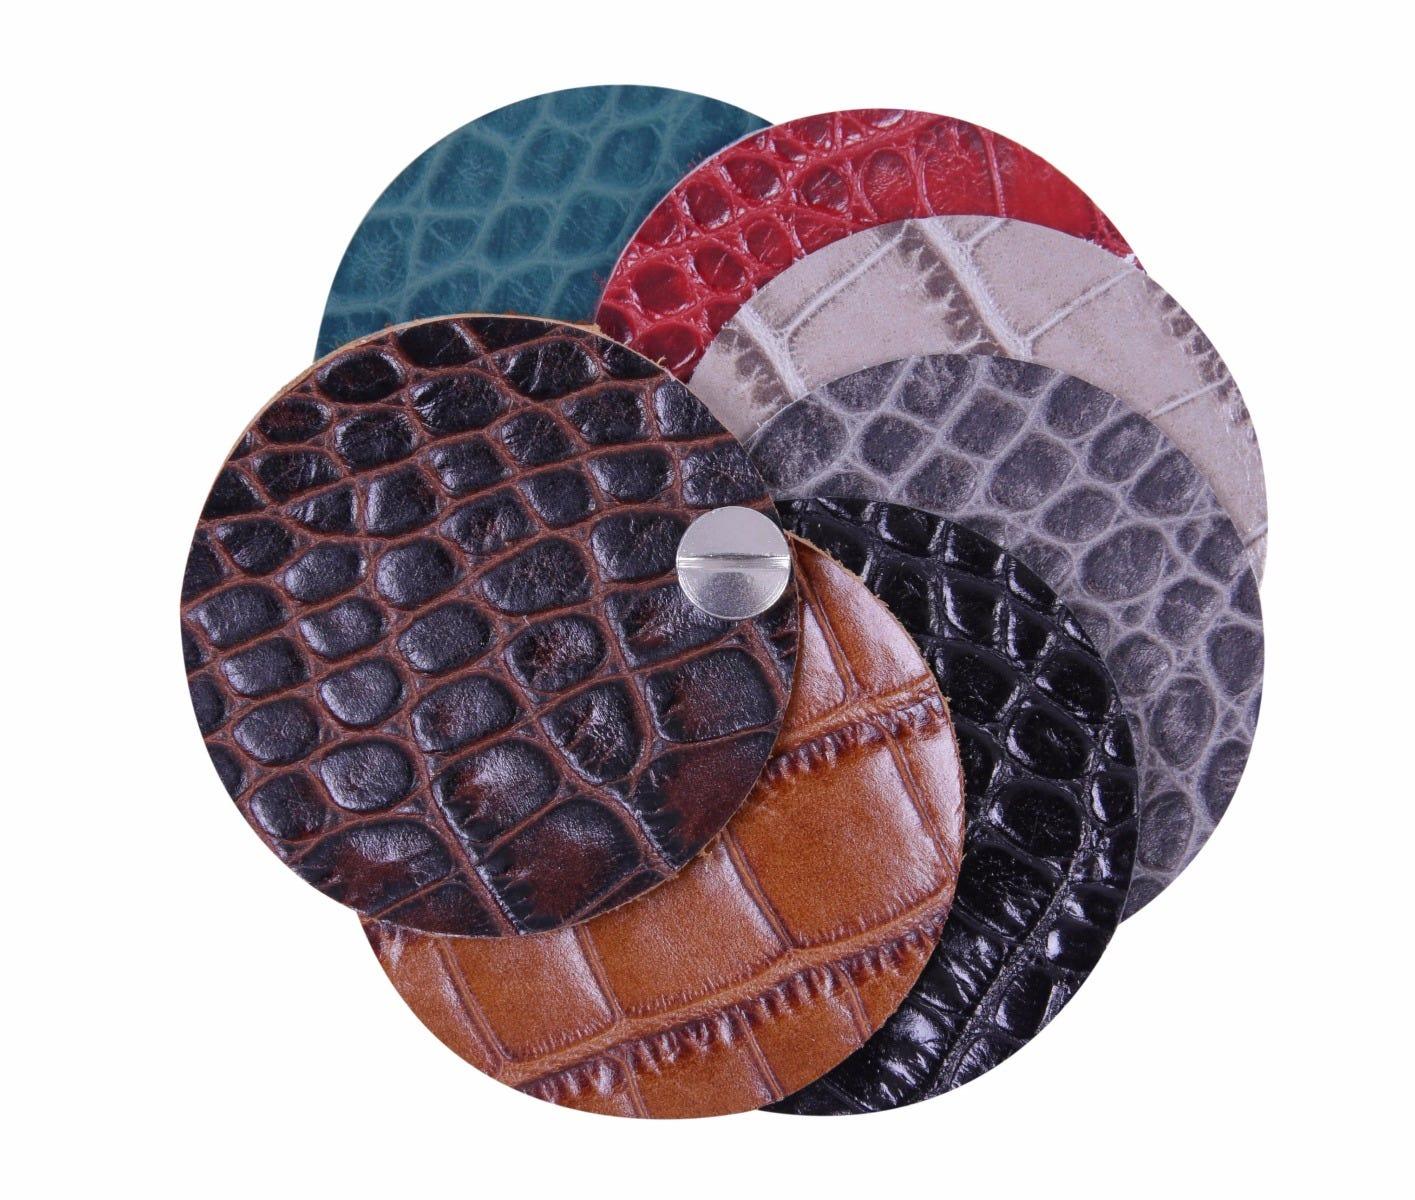 Calf-skin Crocodile style leather swatch